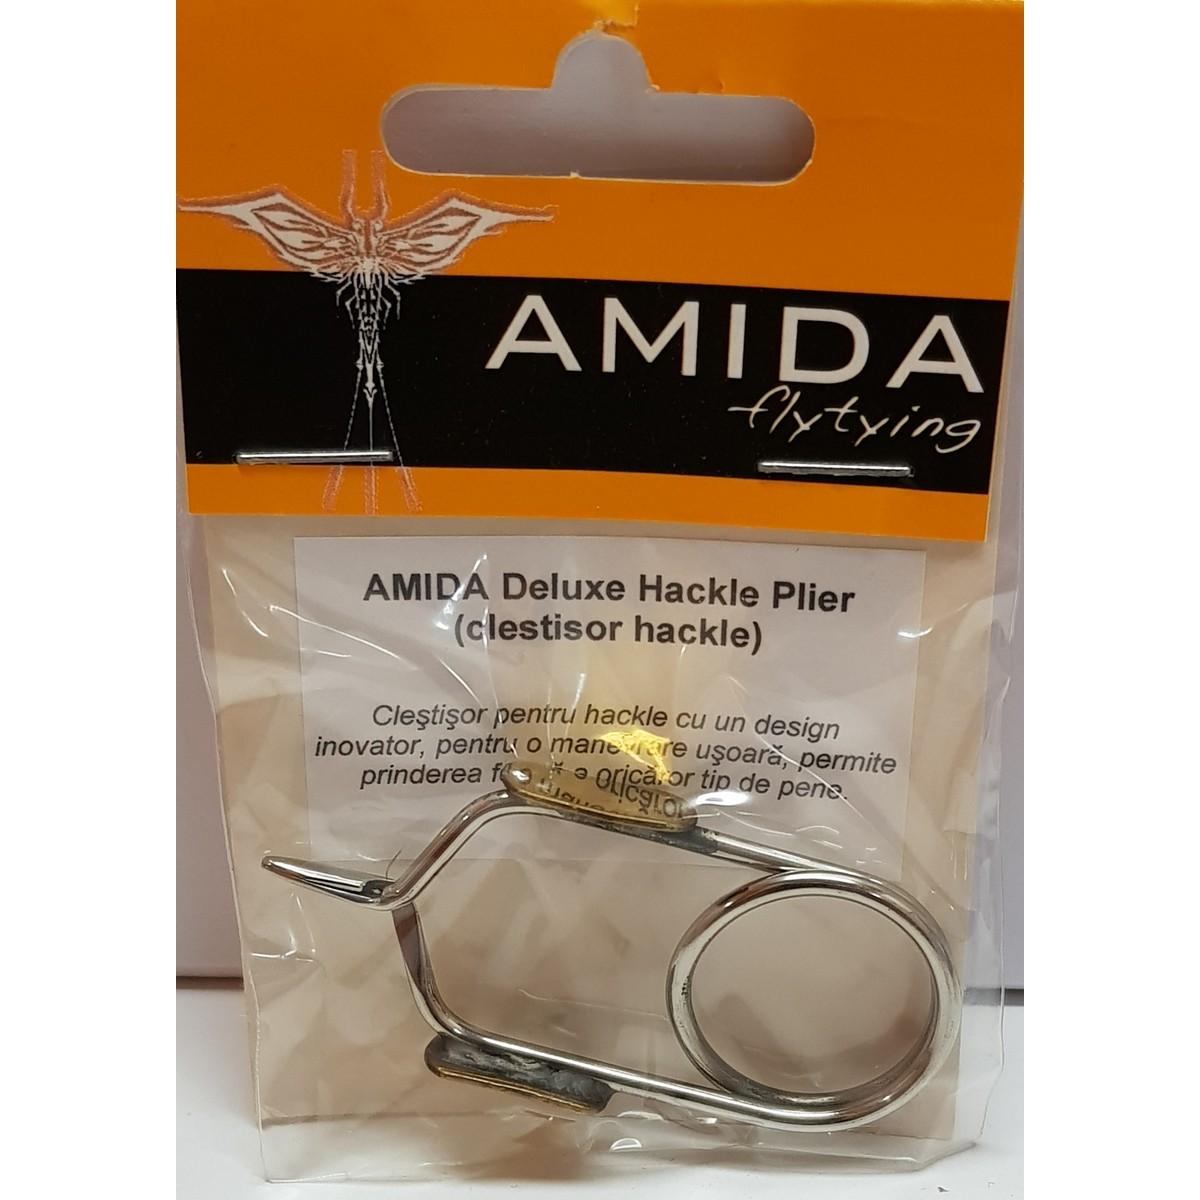 AMIDA DELUXE HACKLE PLIER (CLESTISOR HACKLE)